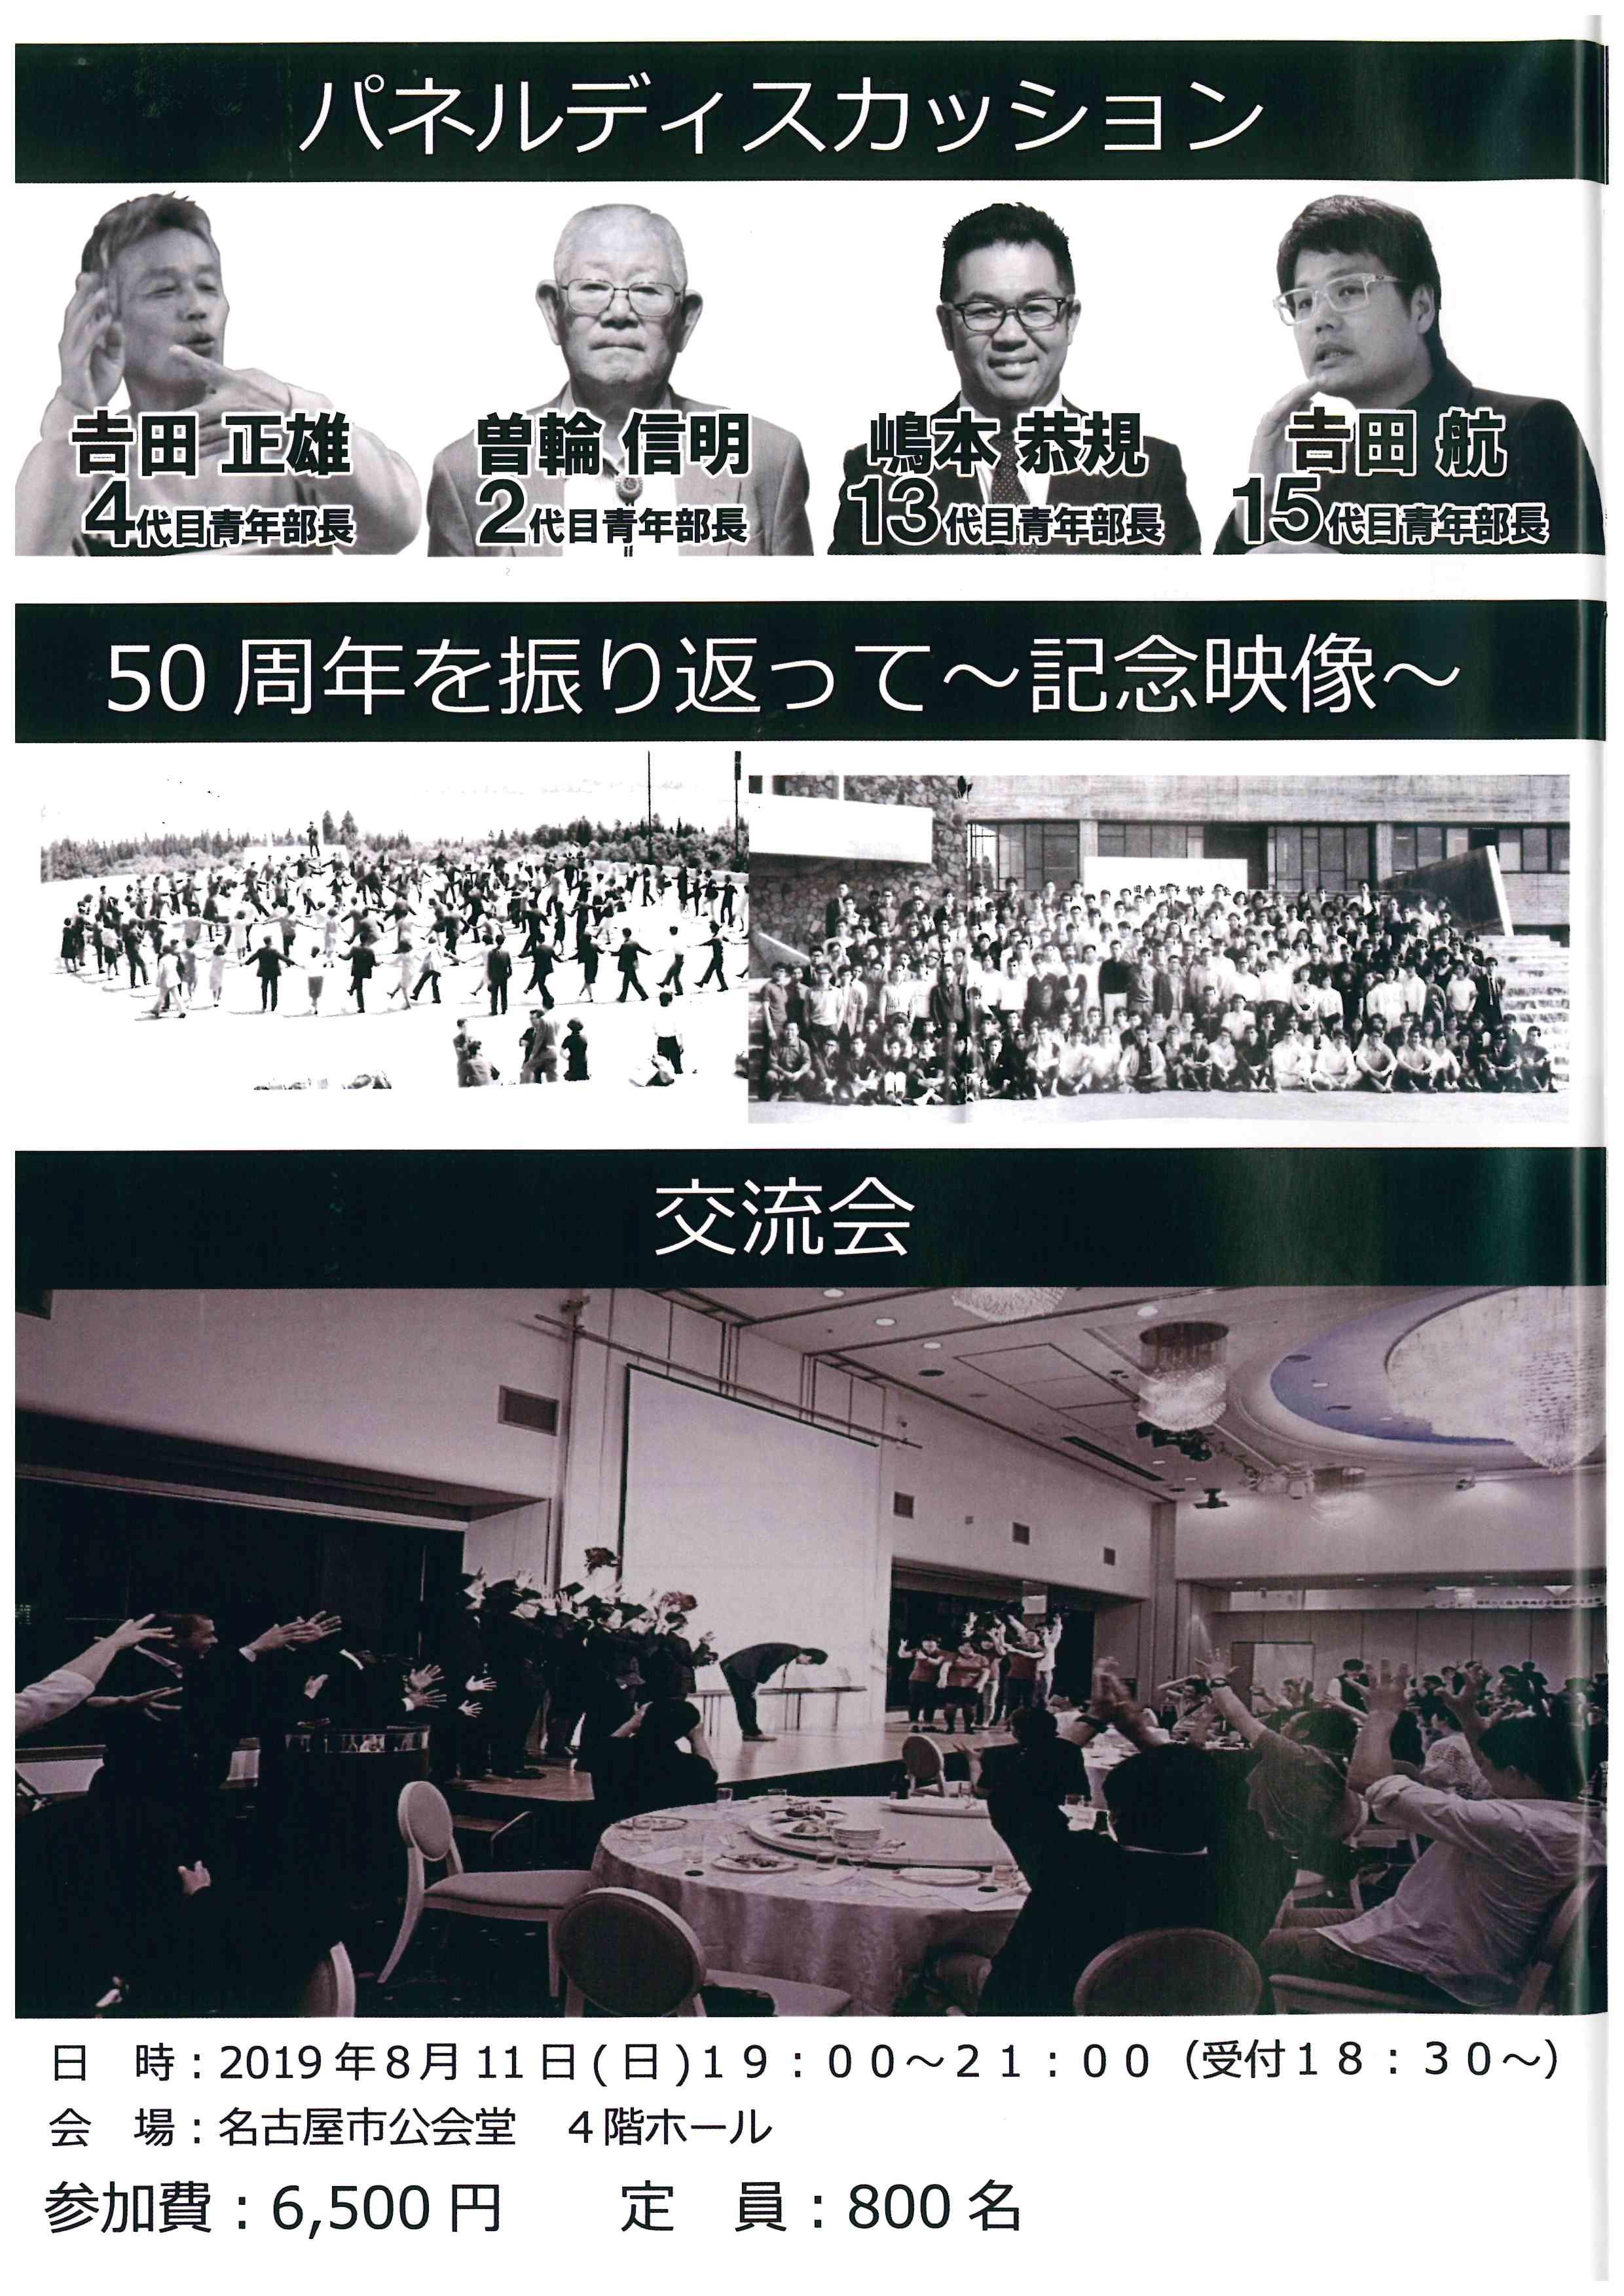 全日本ろうあ連盟青年部発足50周年記念大会 2次募集_d0070316_16144775.jpg